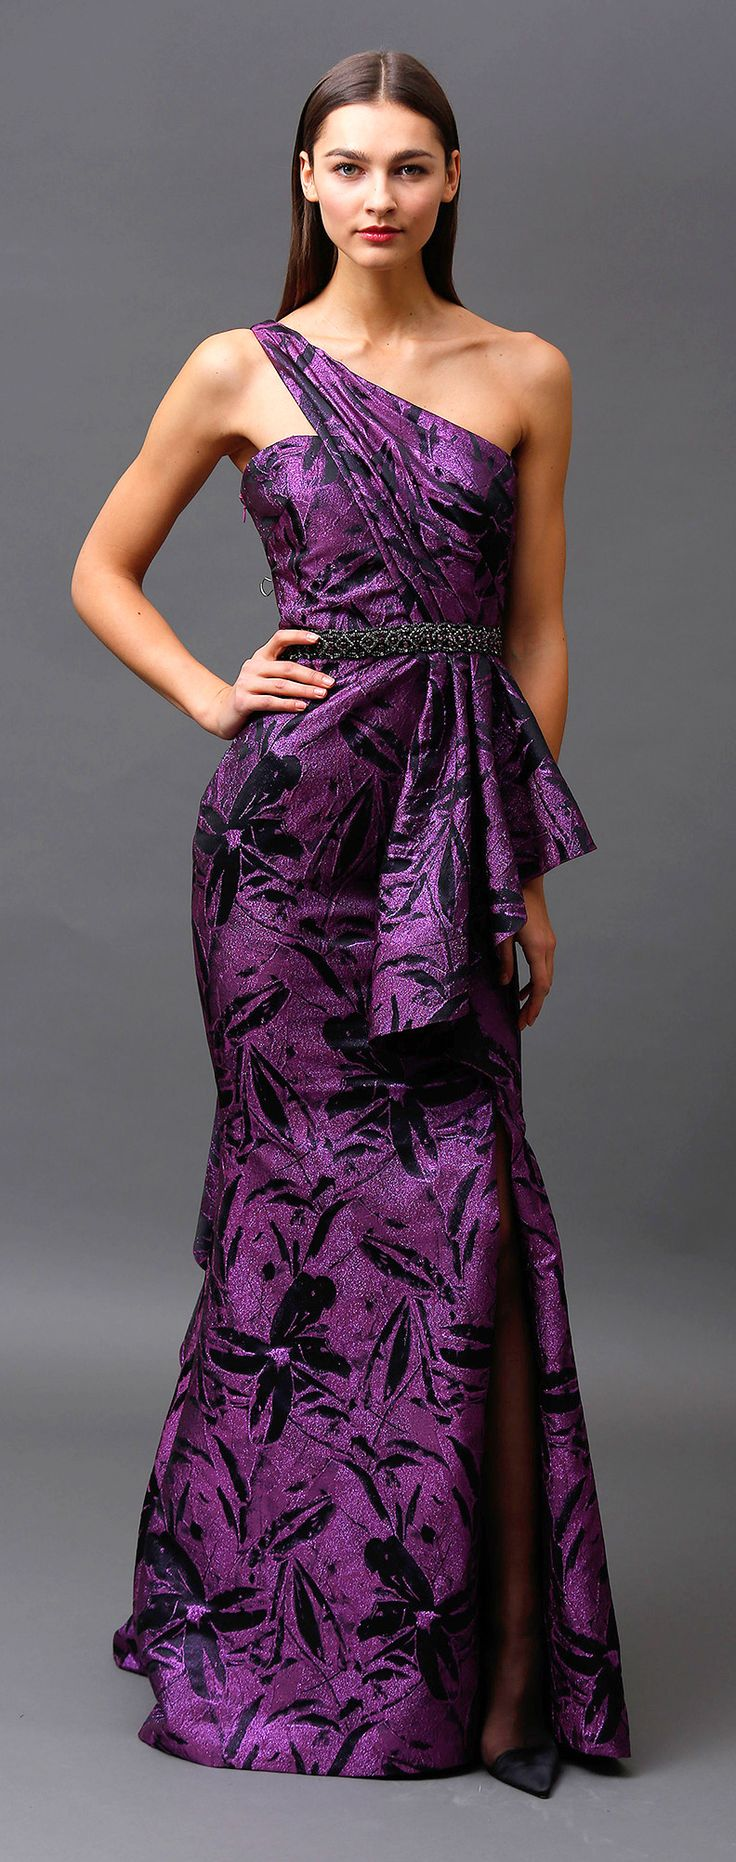 12 best Dress ideas Jisoo Wedding! images on Pinterest | Bridesmade ...